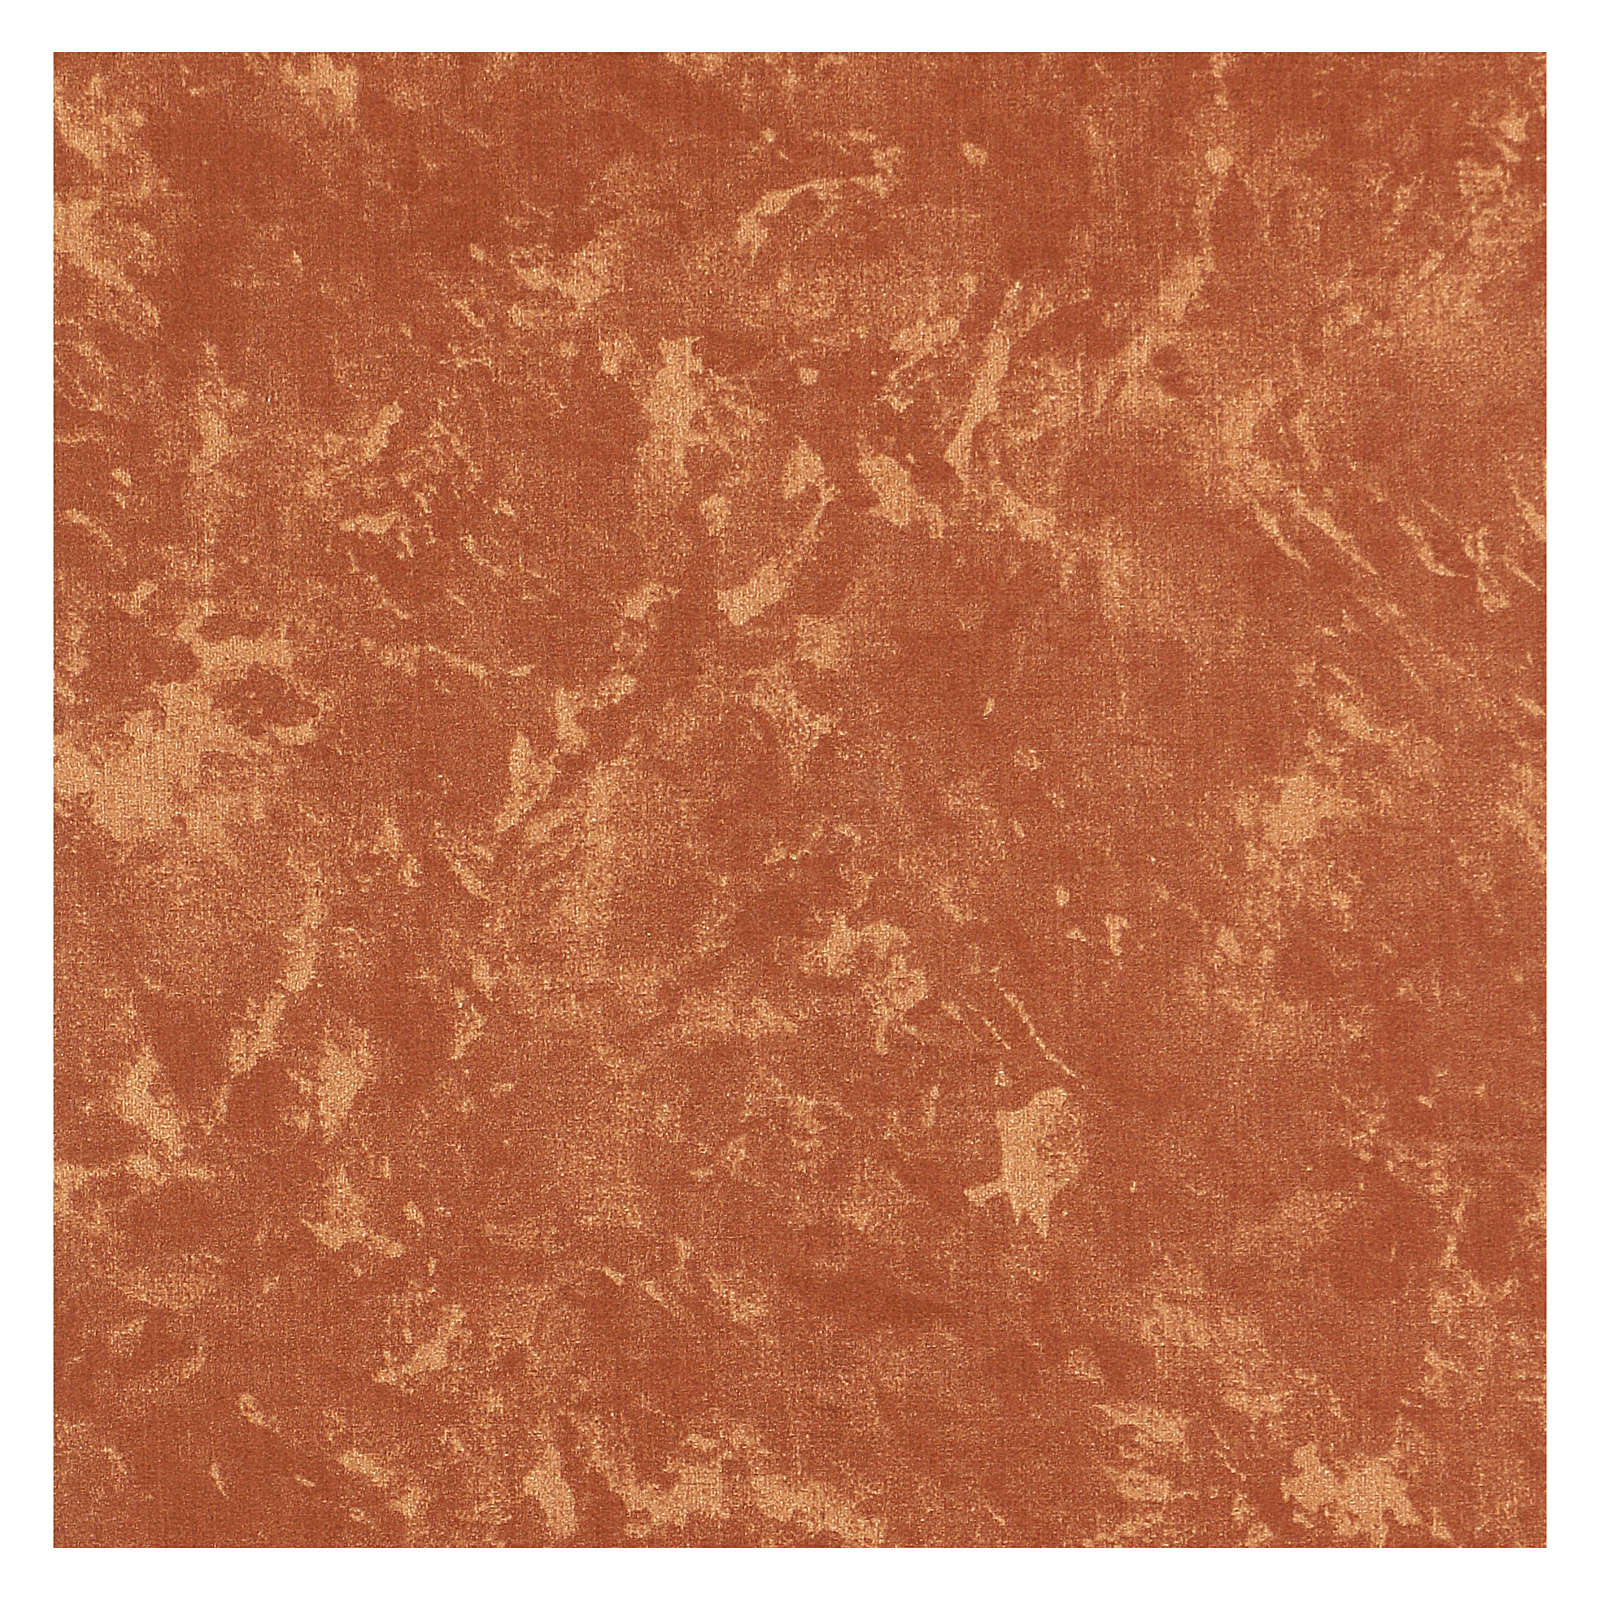 Carta terra rossa plasmabile 60x30 cm per presepi 4